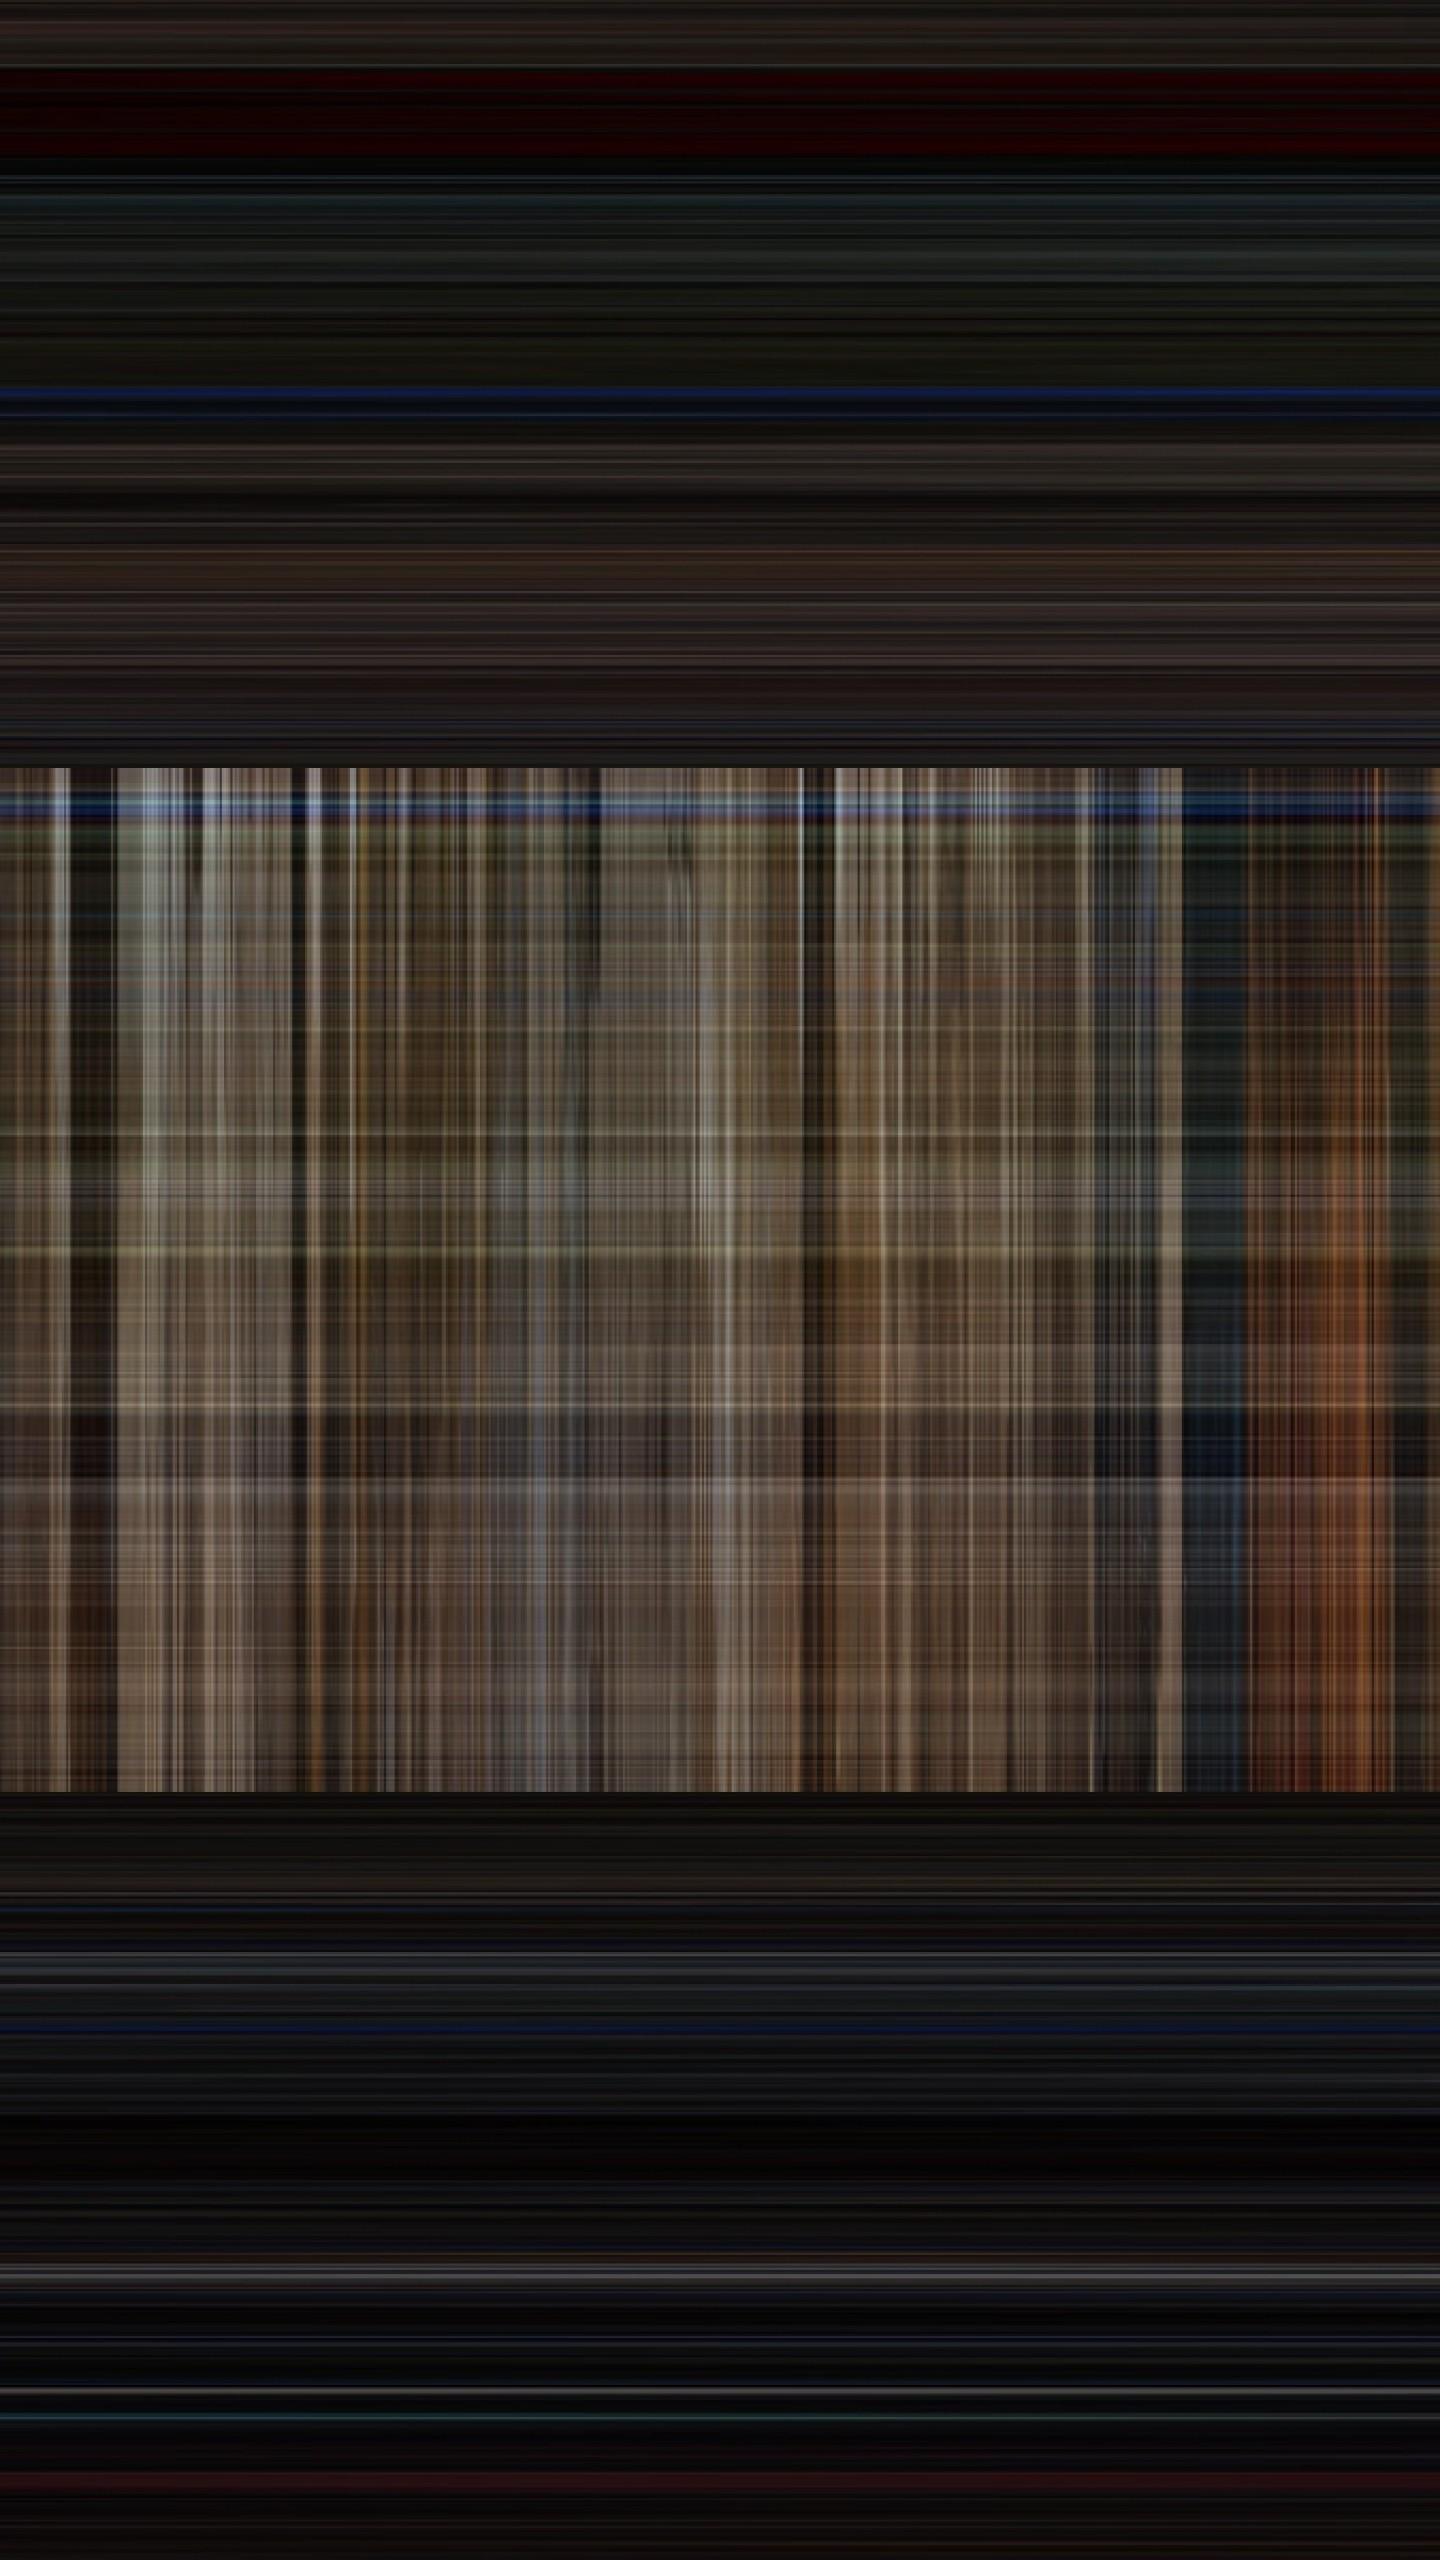 Wallpaper line, vertical, horizontal, stripes, brown